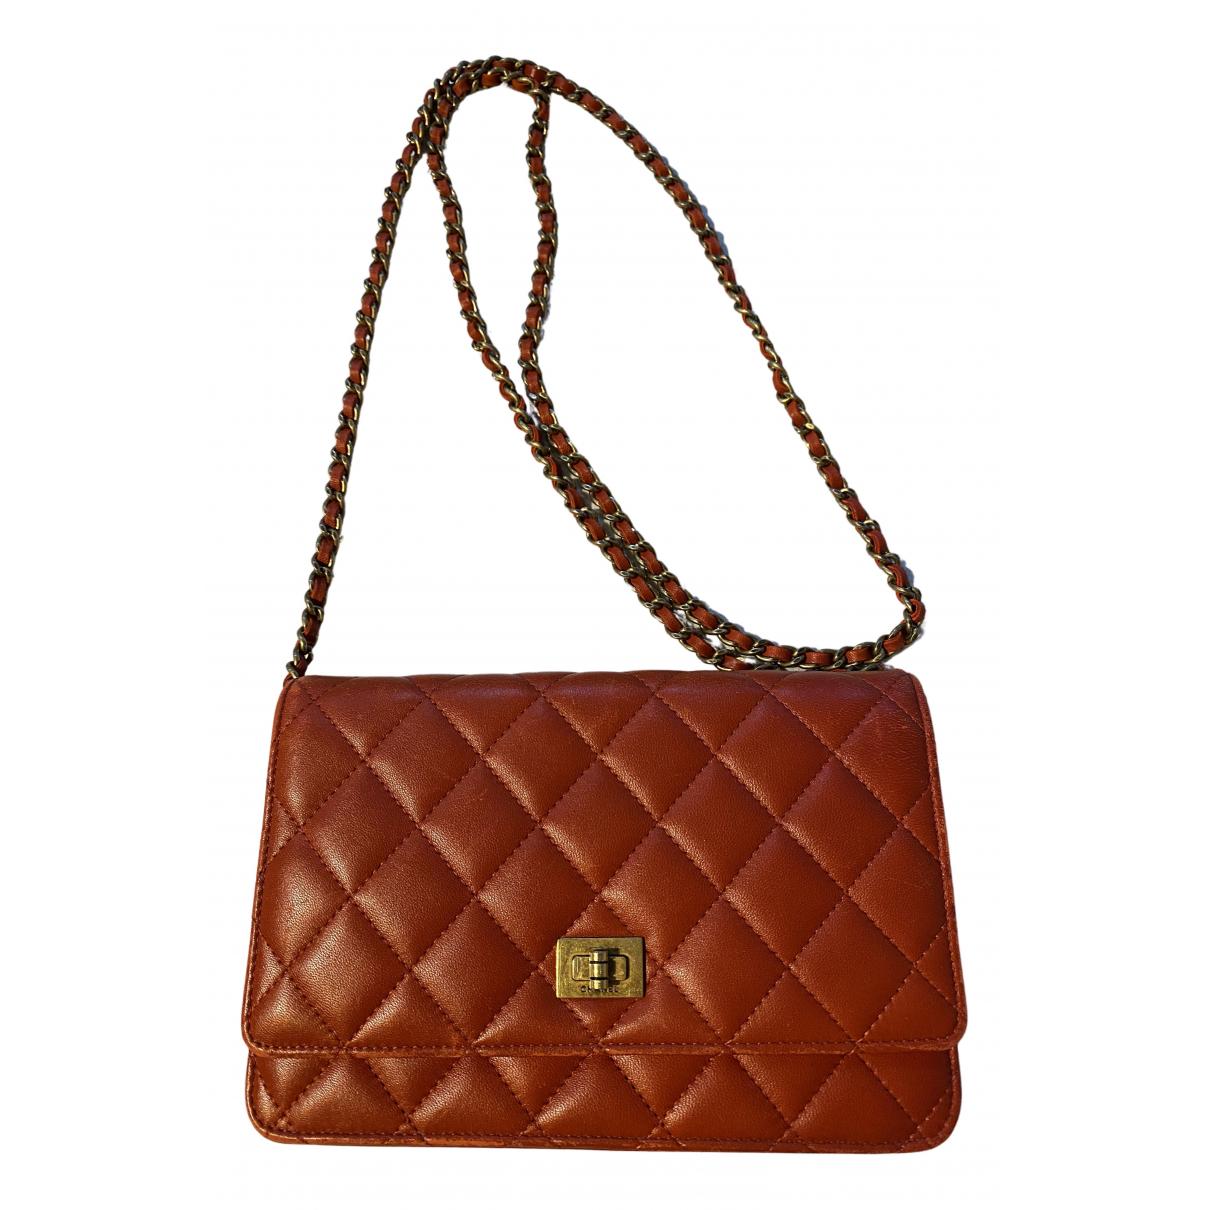 Chanel Wallet on Chain Handtasche in  Rot Leder